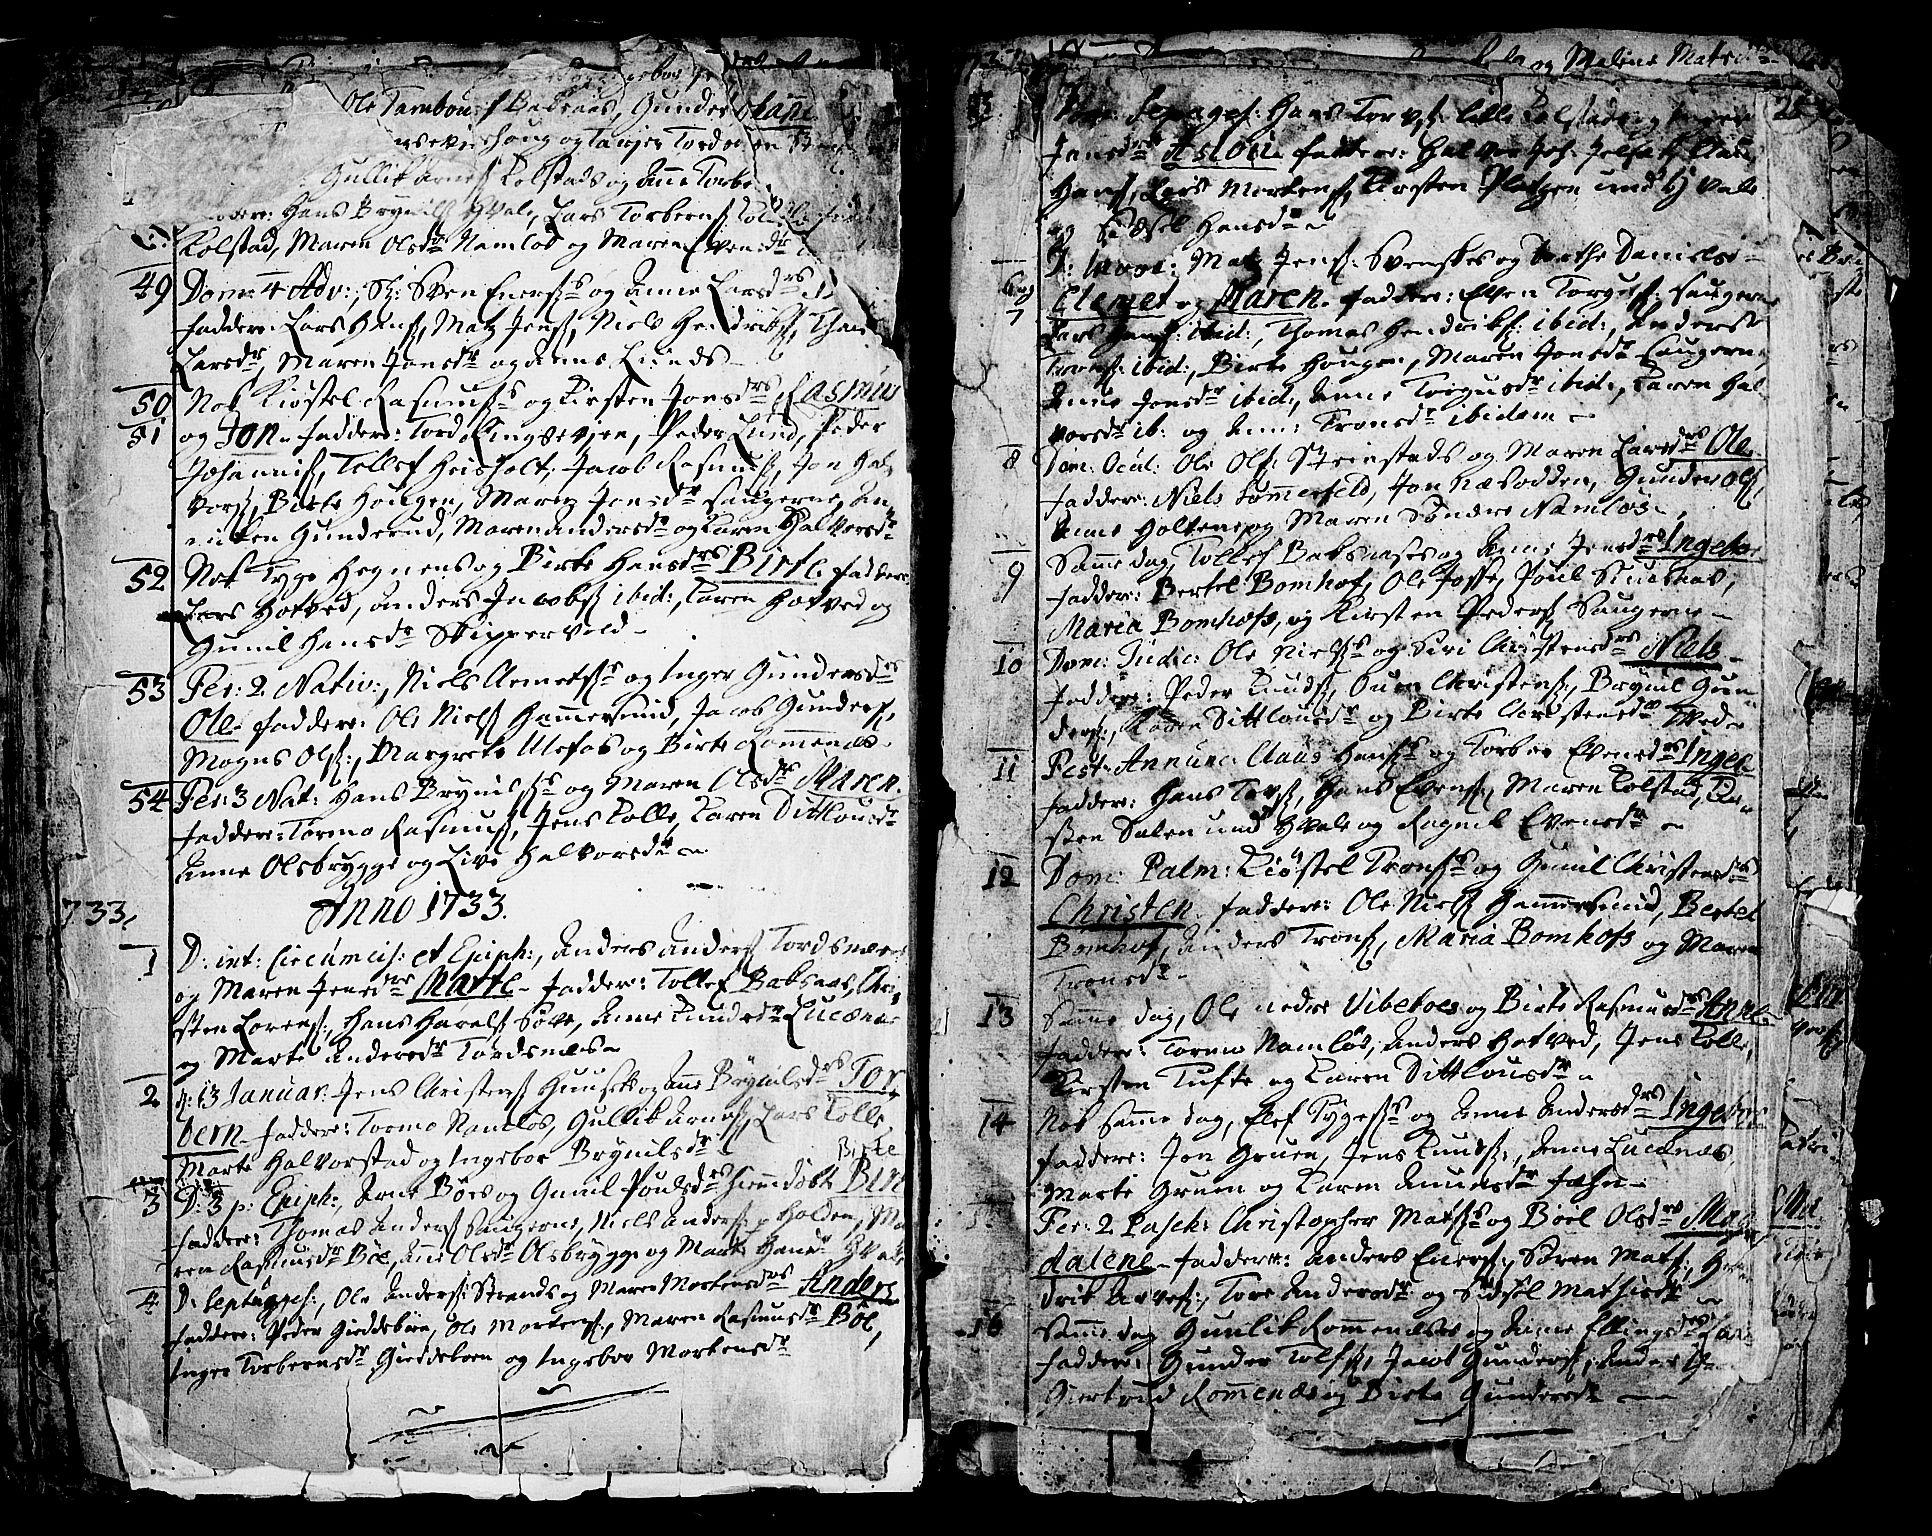 SAKO, Holla kirkebøker, F/Fa/L0001: Ministerialbok nr. 1, 1717-1779, s. 22